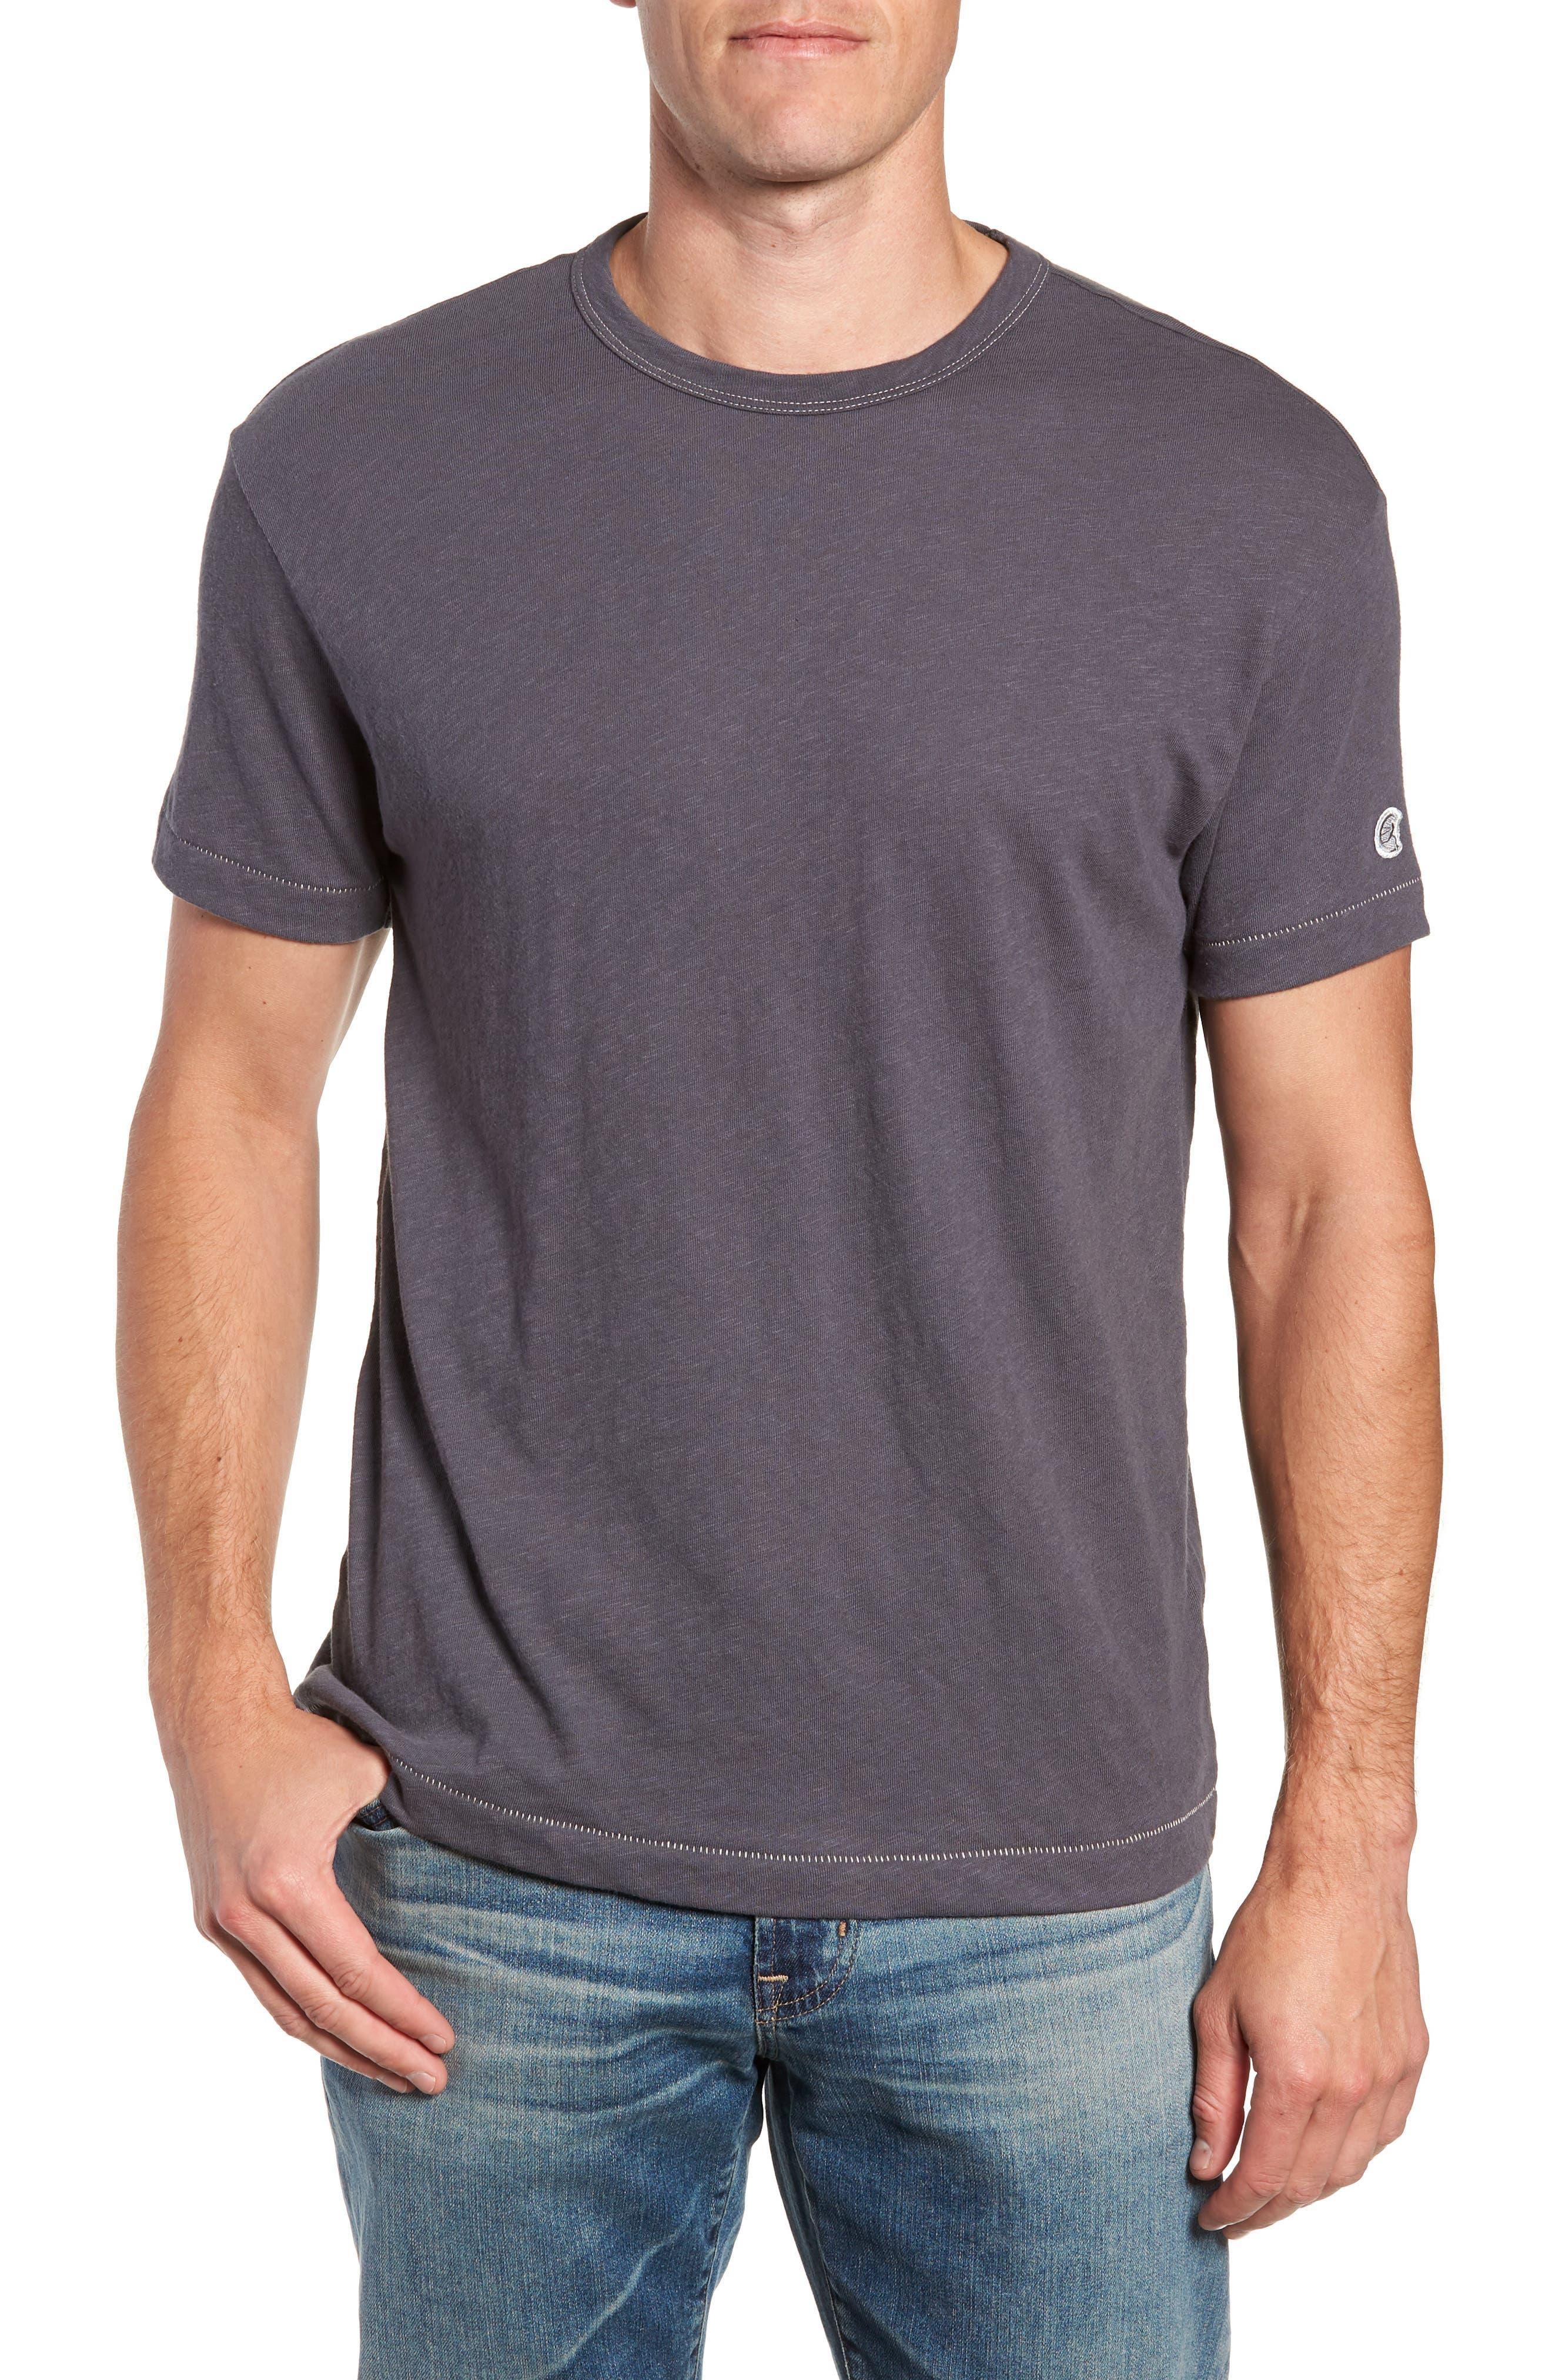 TODD SNYDER + Champion Crewneck T-Shirt, Main, color, 060